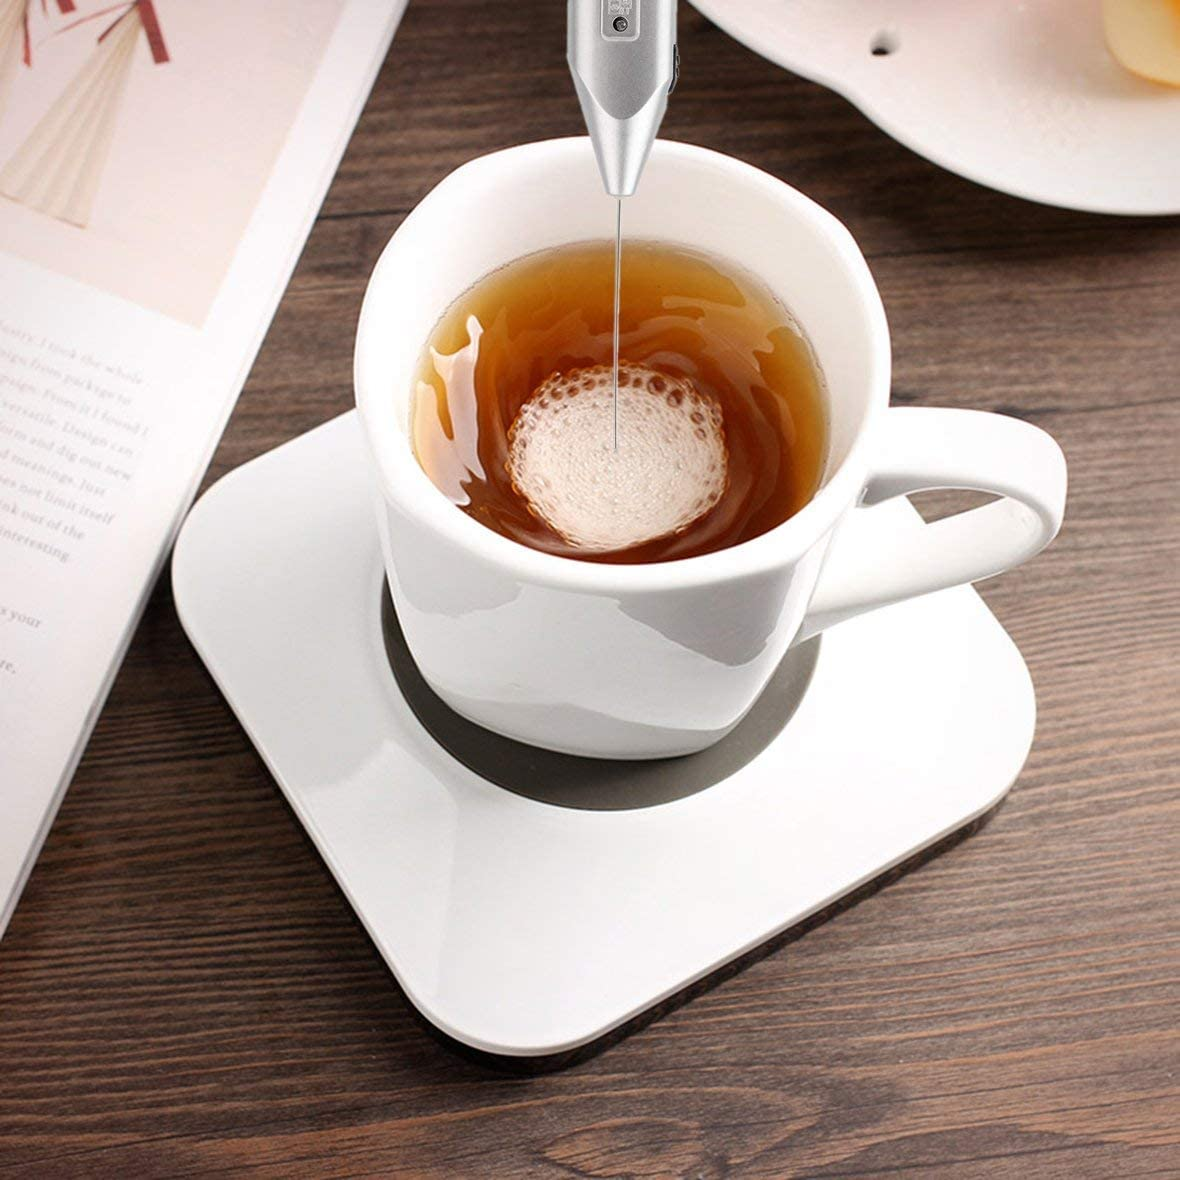 Cordless Milk Frother Handheld Foamer Cappuccino Maker Latte Espresso Chocolate Coffee Metal Kitchen Mixer Handy Guard Stiring #Pennytupu